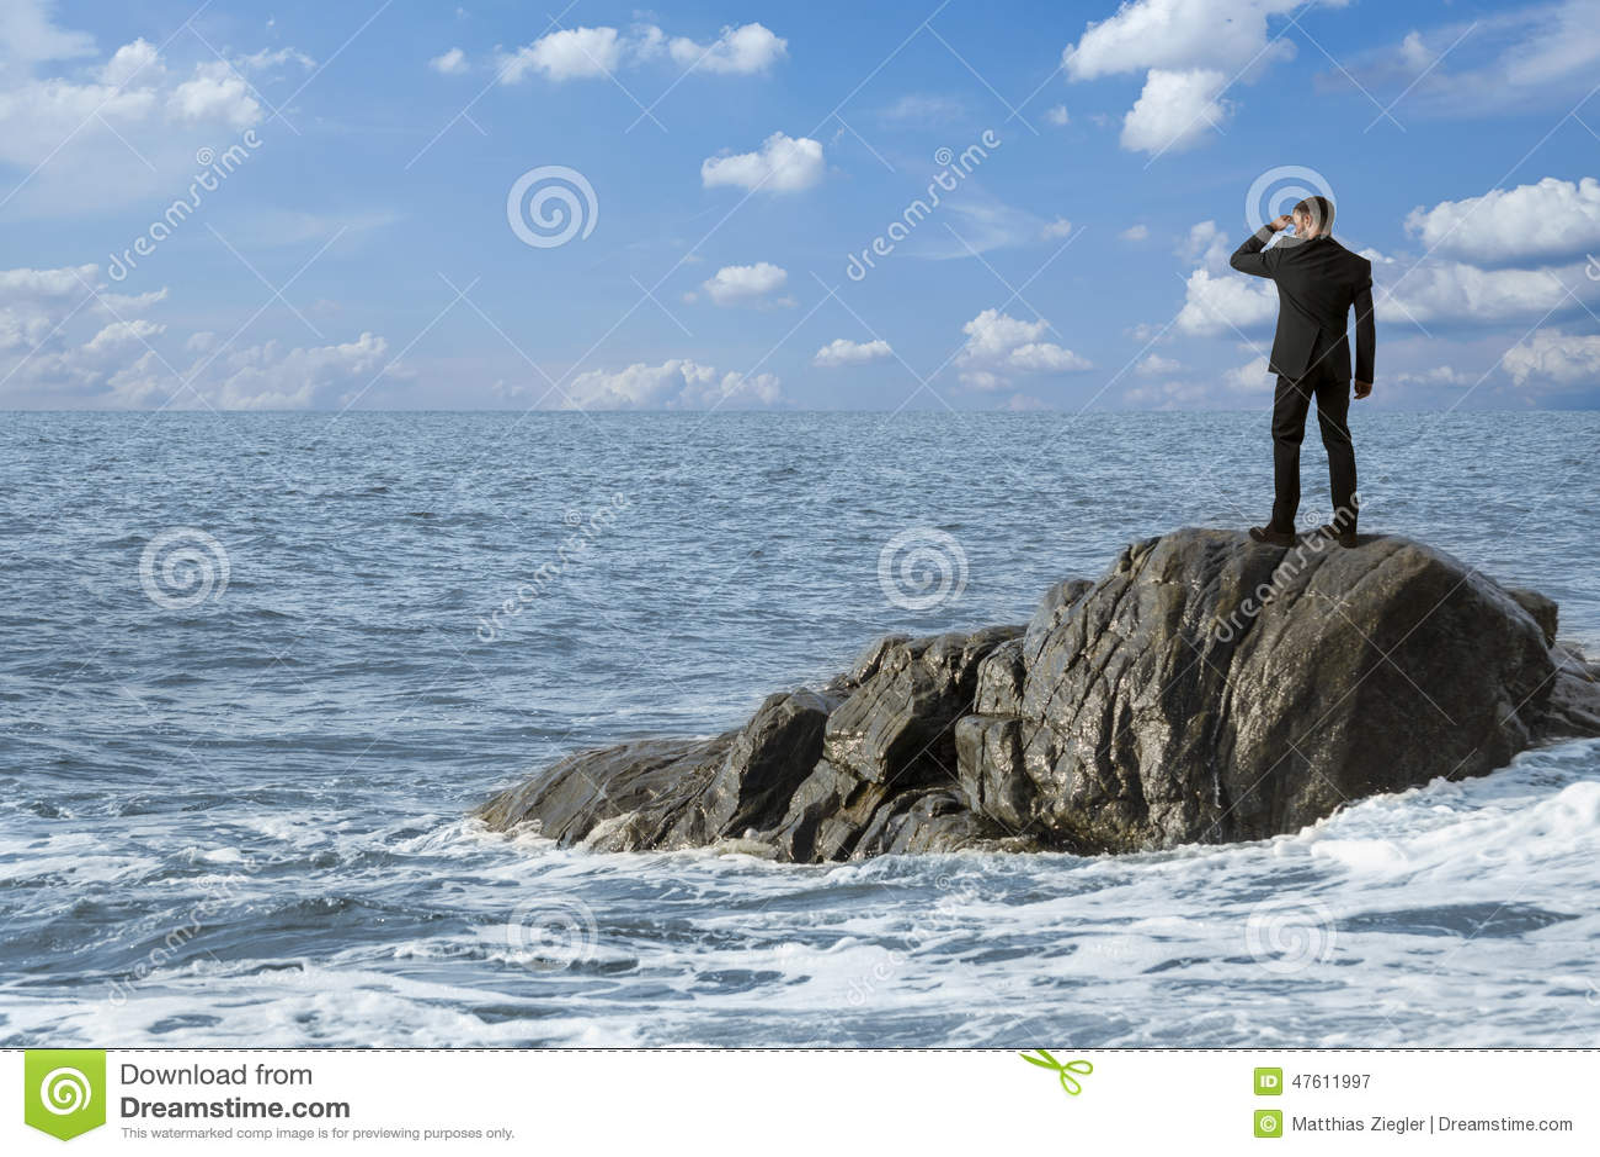 Observing man on rocks in the sea